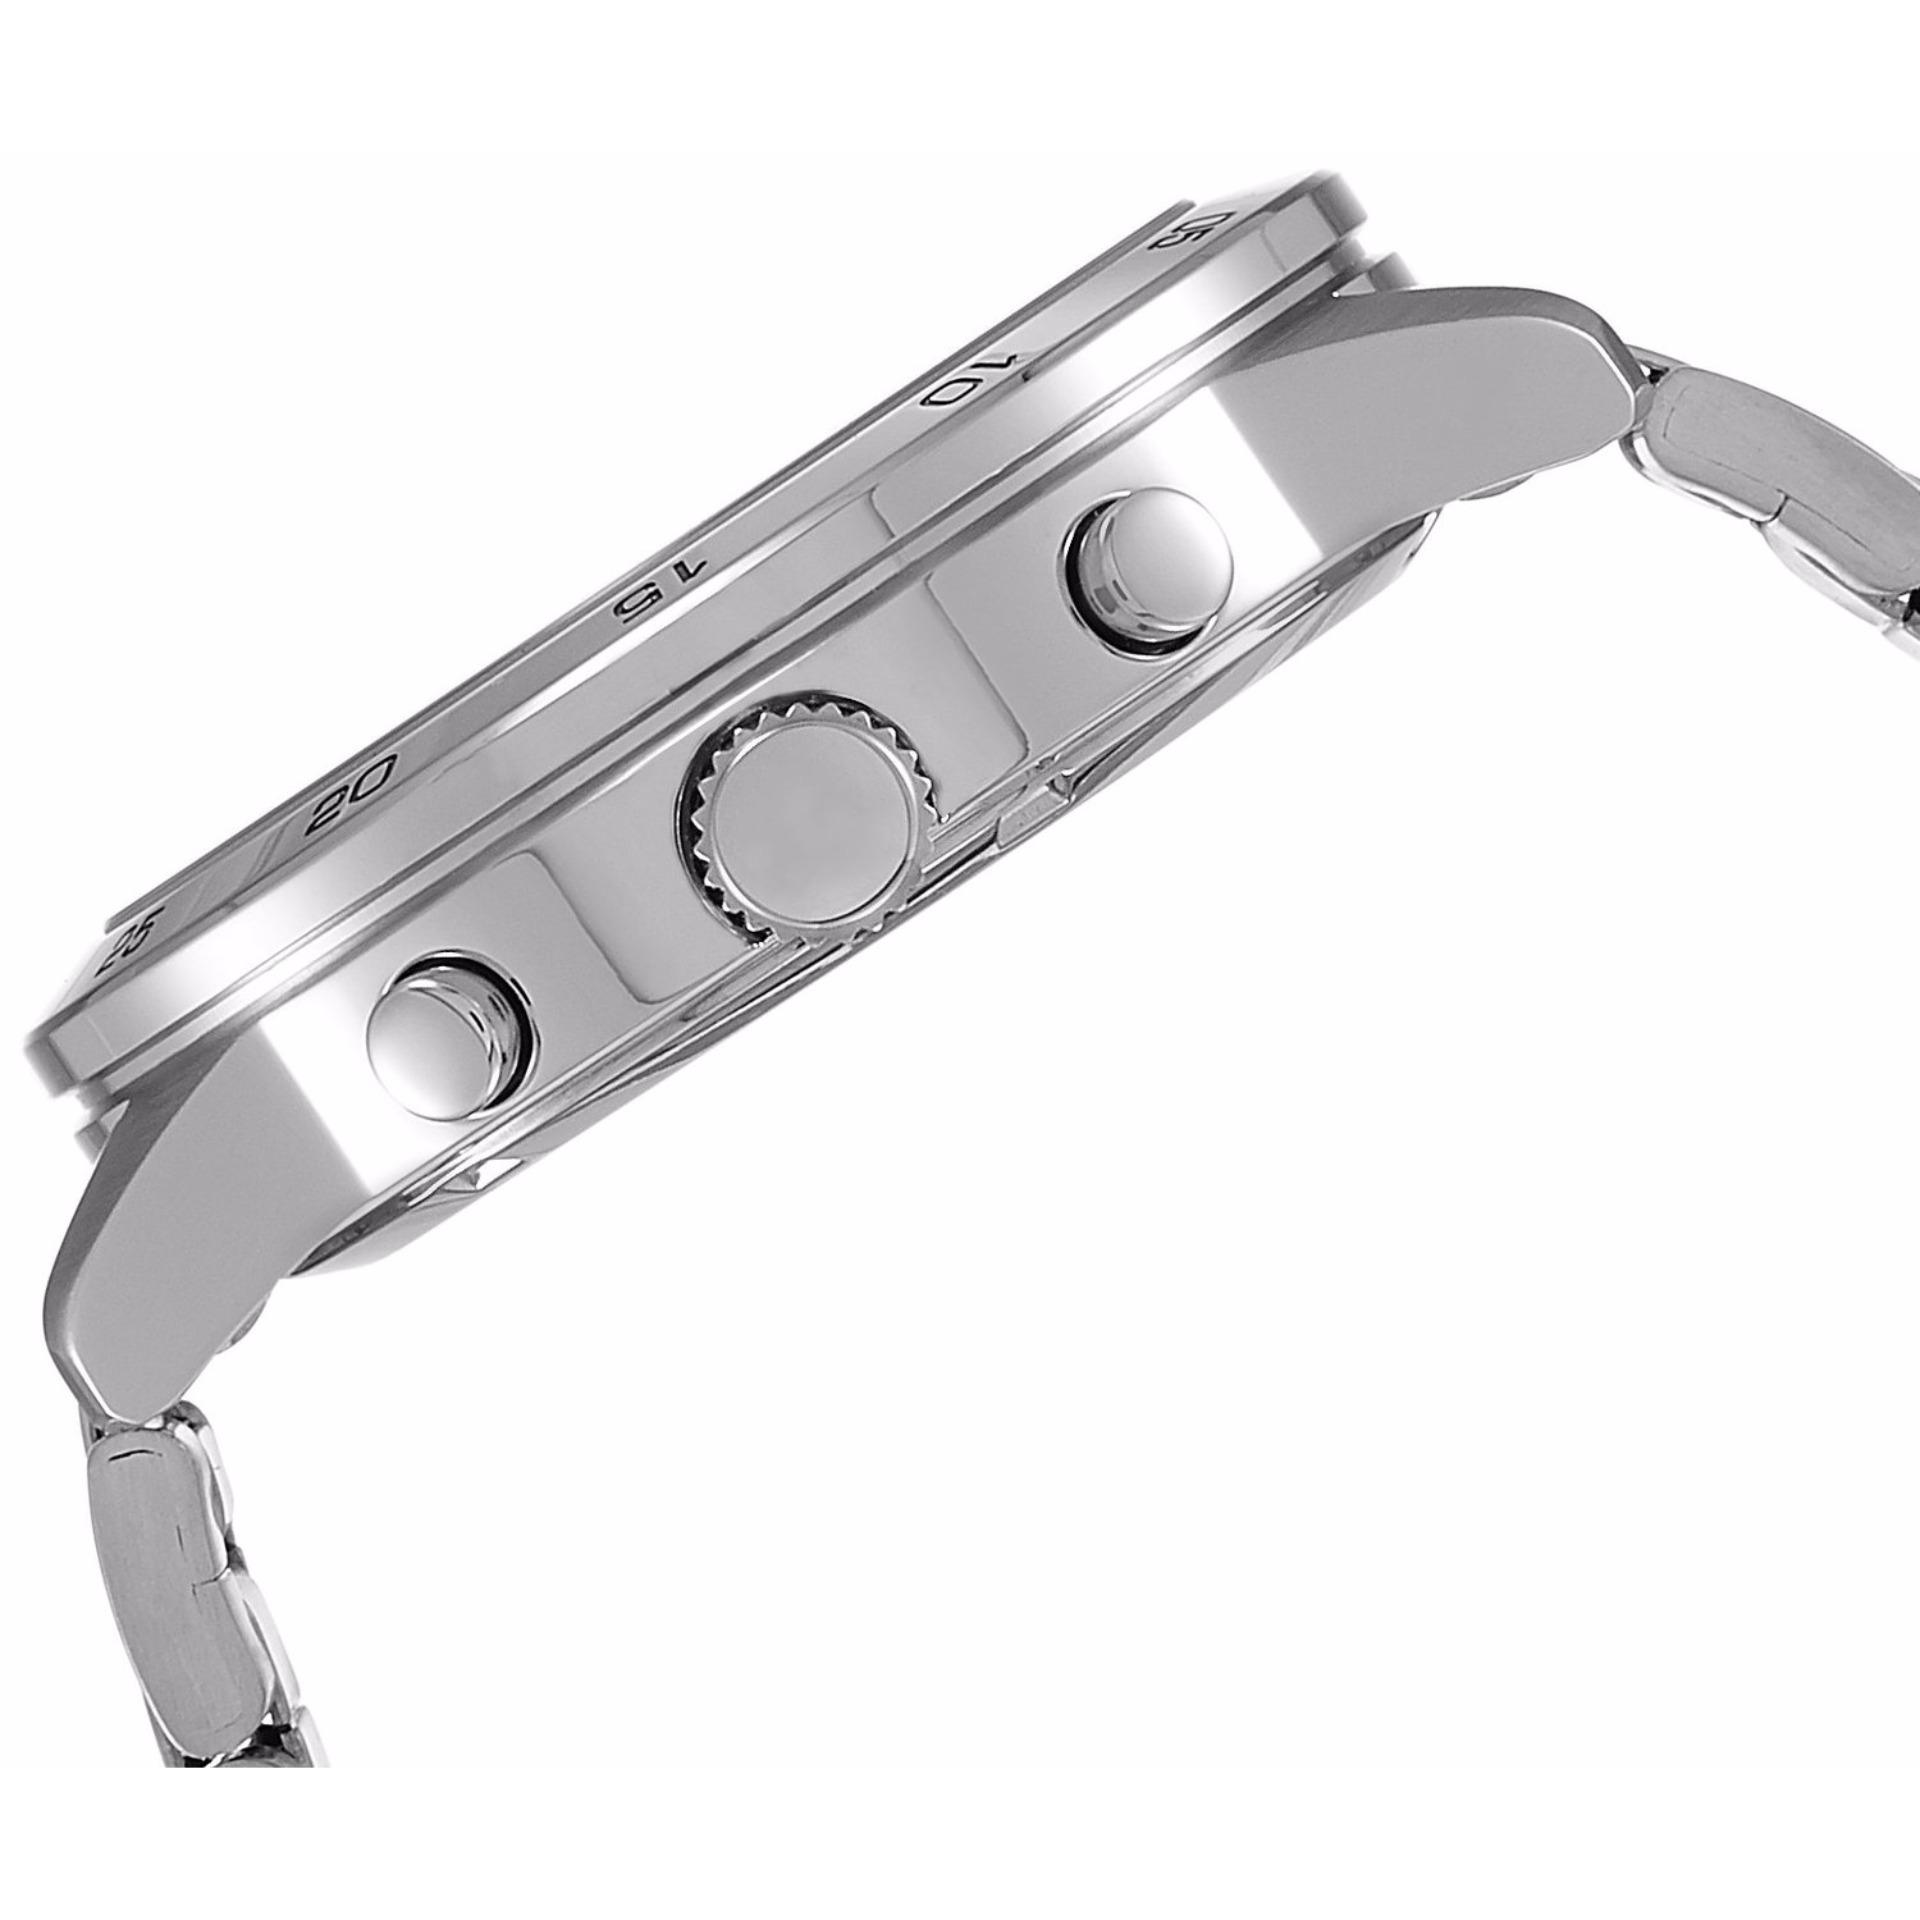 Seiko Chronograph Jam Tangan Pria Tali Stainless Steel Sks515p1 Strap Silver Sks521p1 Stell